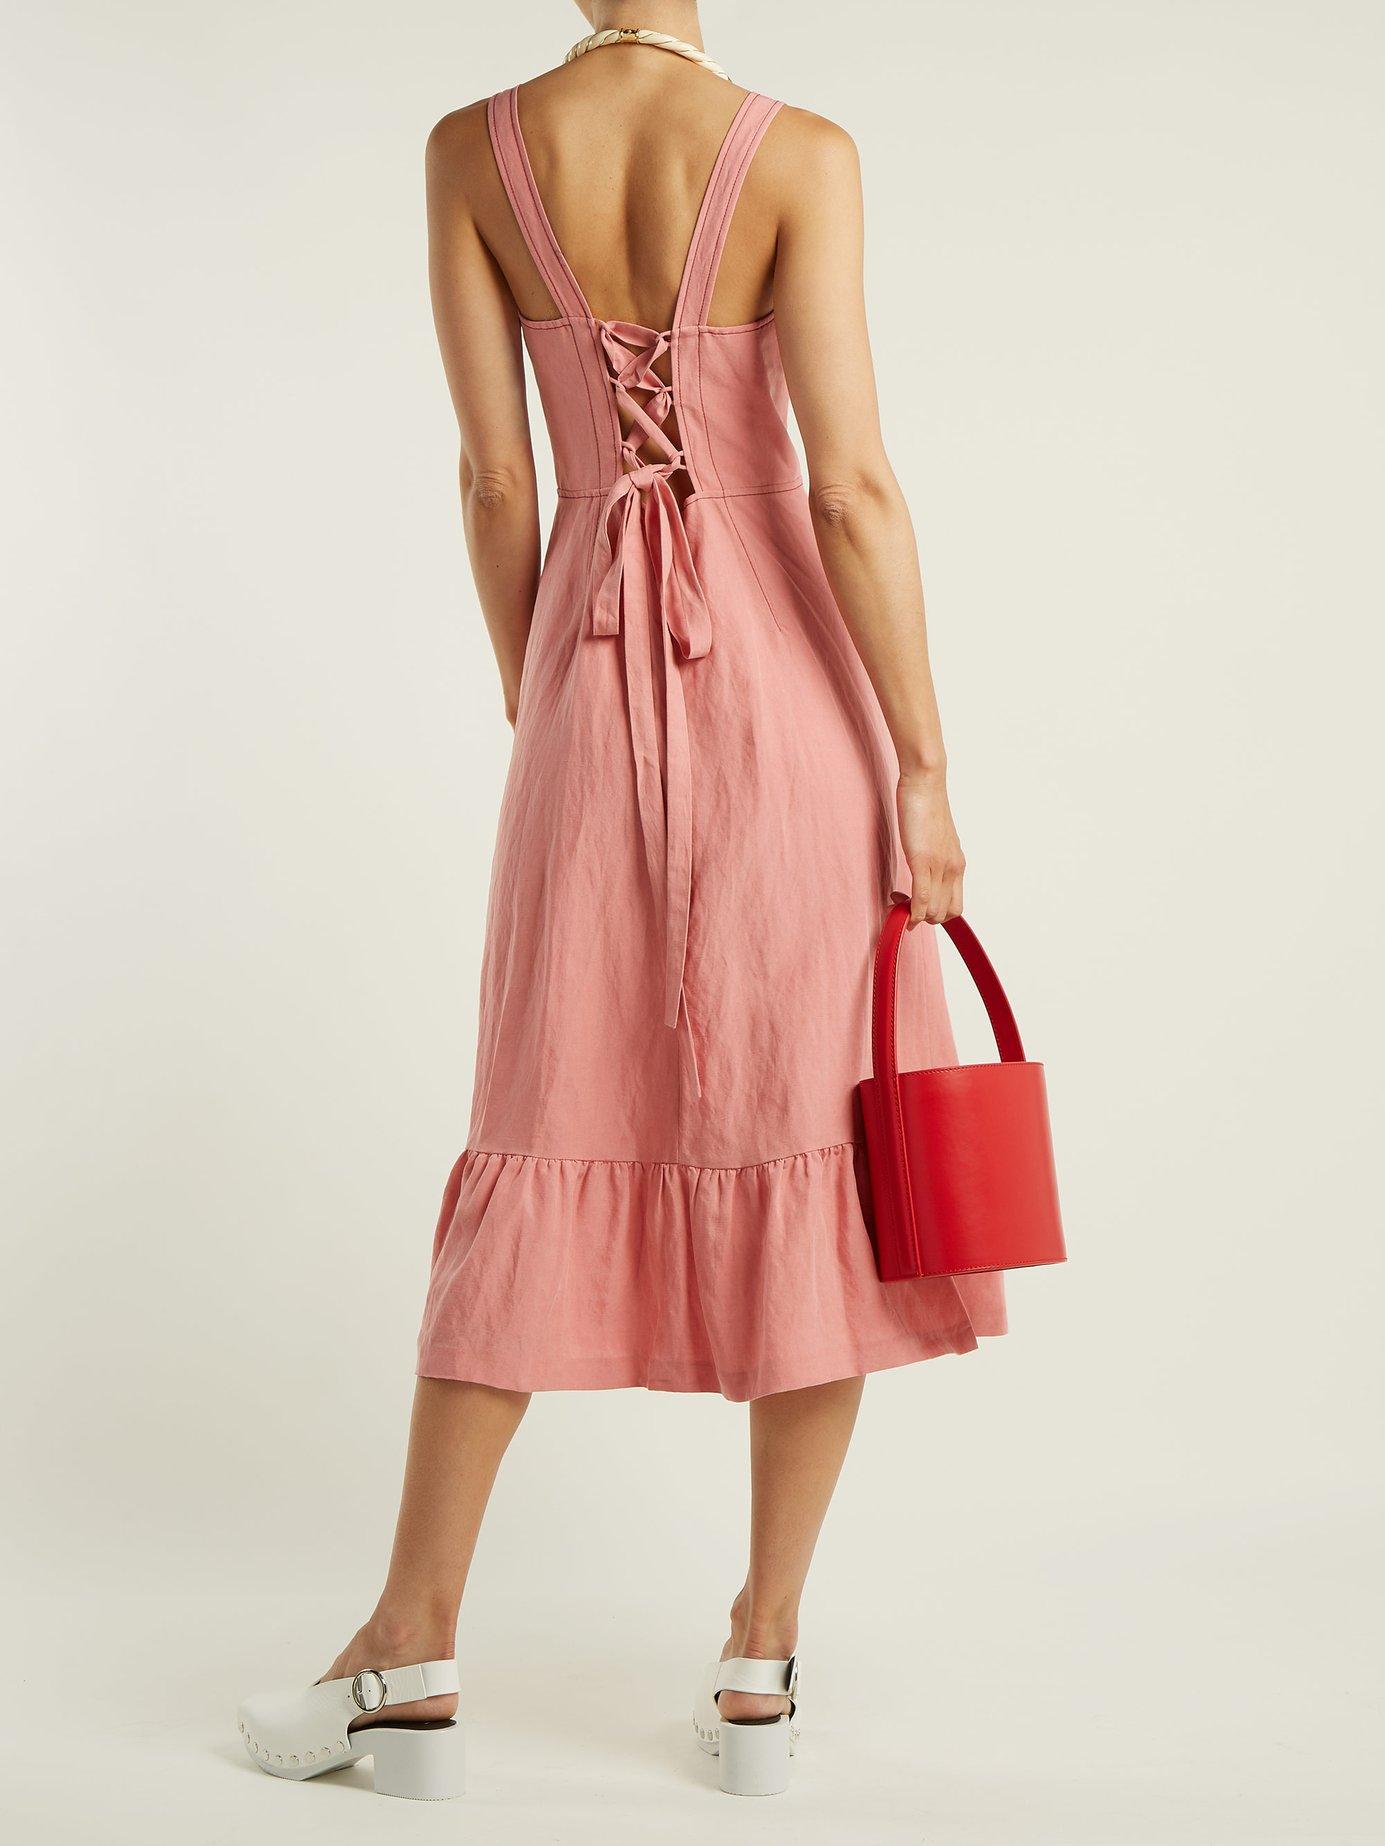 Lace-up back linen midi dress by Rebecca Taylor